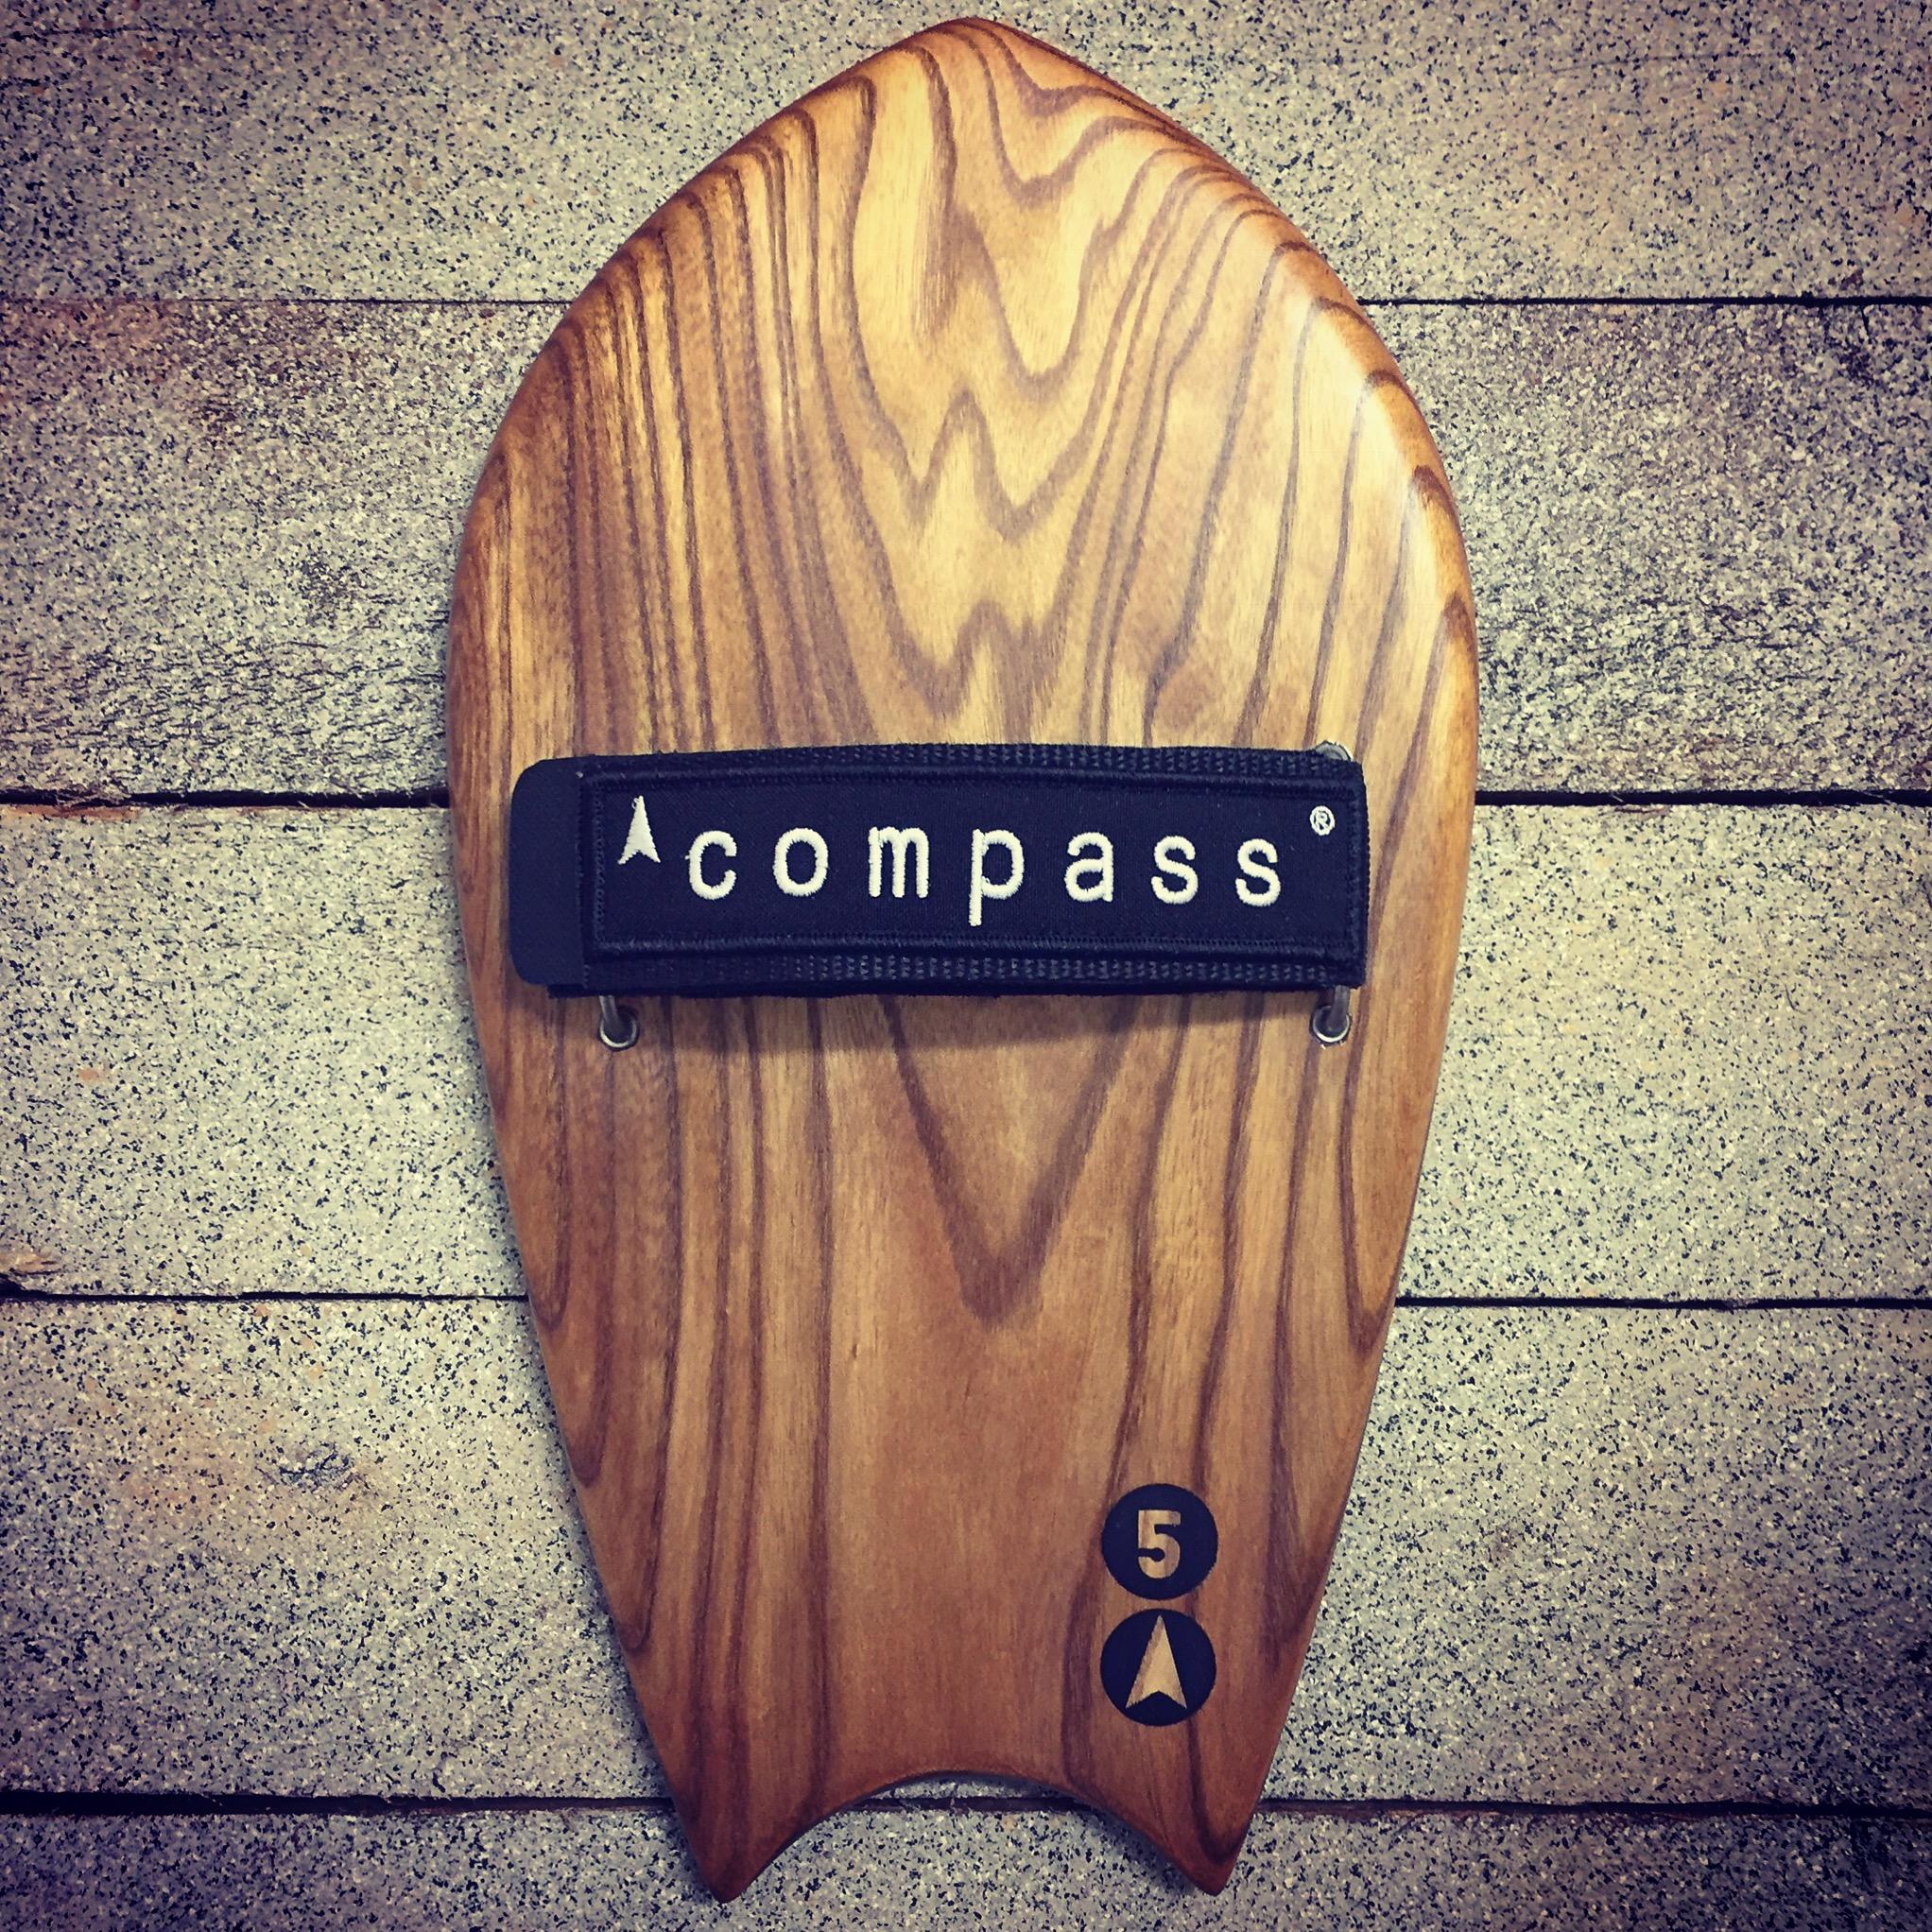 Compass Handplanes bodysurf bodysurfing wooden handplanes for surf big easy surf handplaning handboard handmade workshop for sale in shops